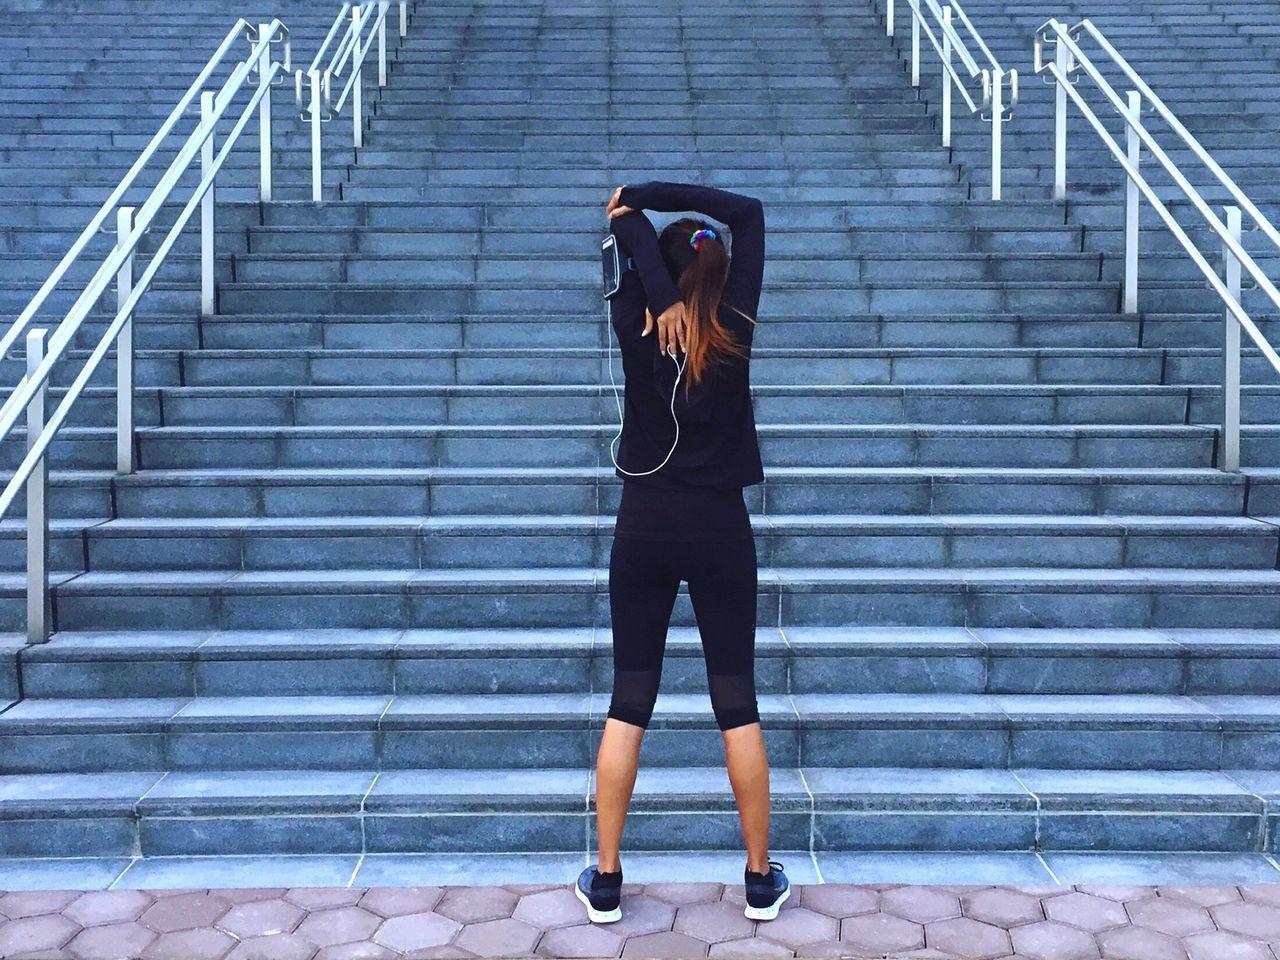 Beautiful stock photos of shoe, Arms Raised, Day, Exercising, Flexibility